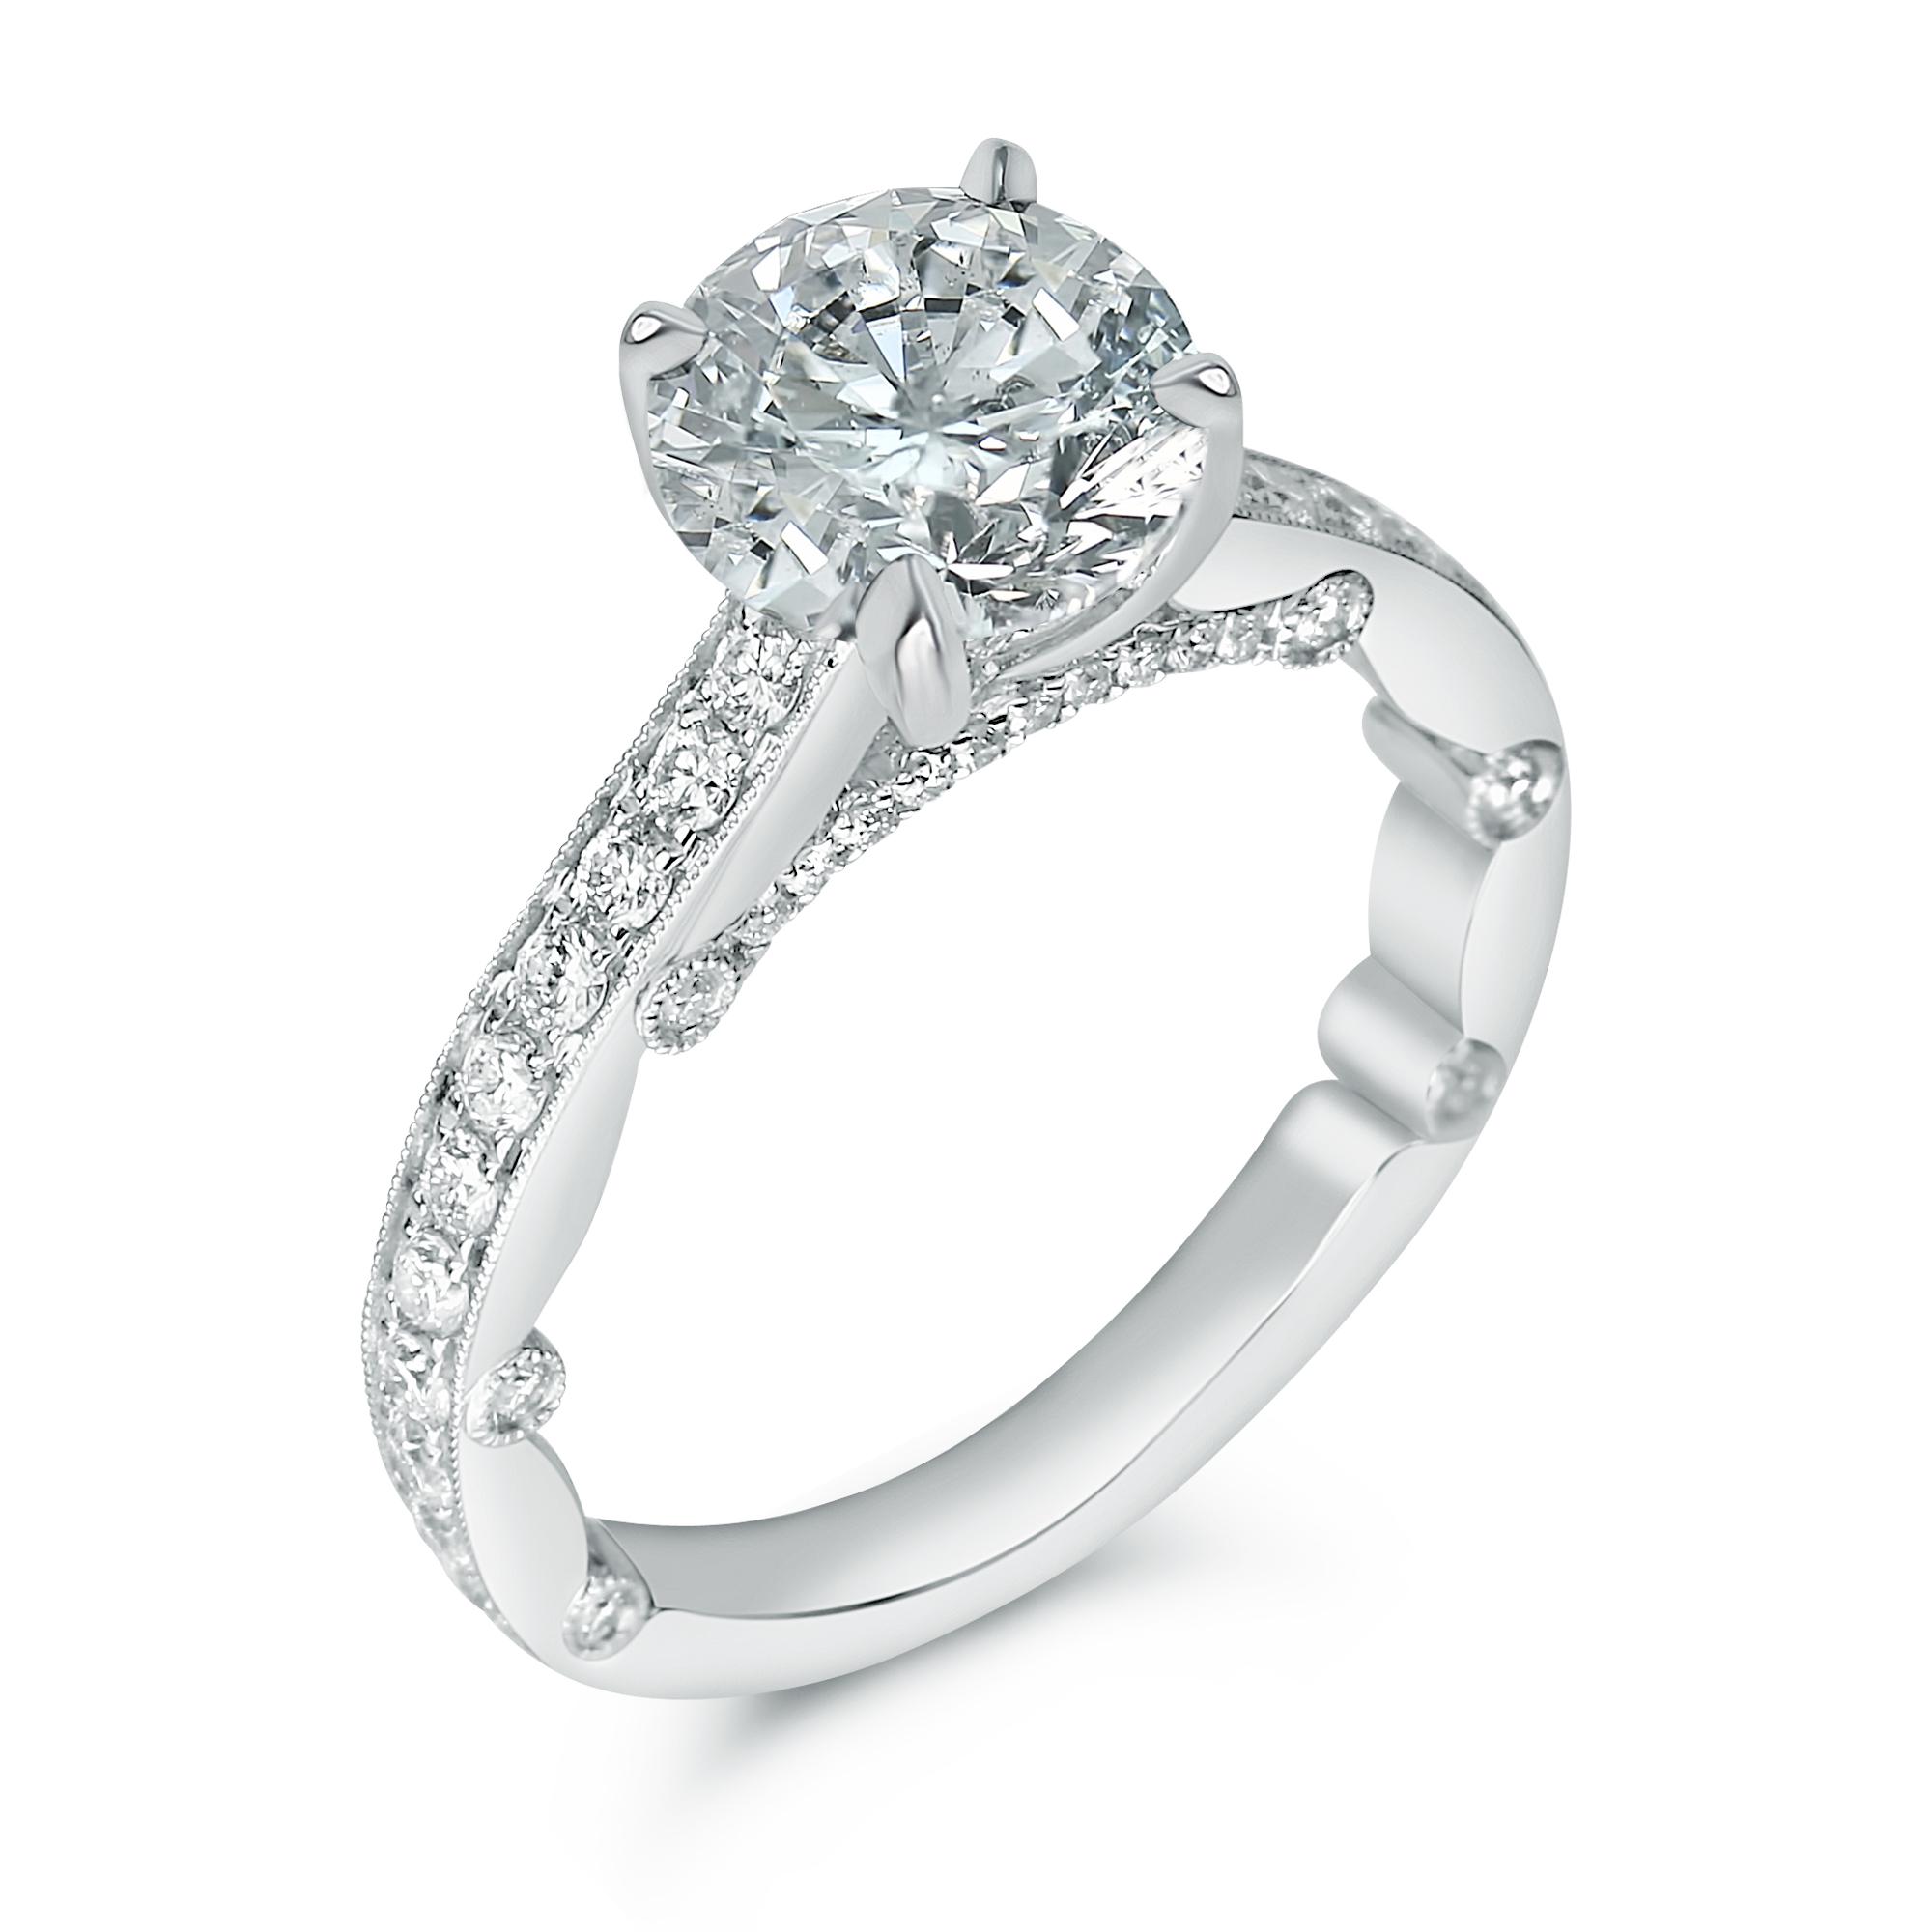 milligrain pave set round designer engagement ring